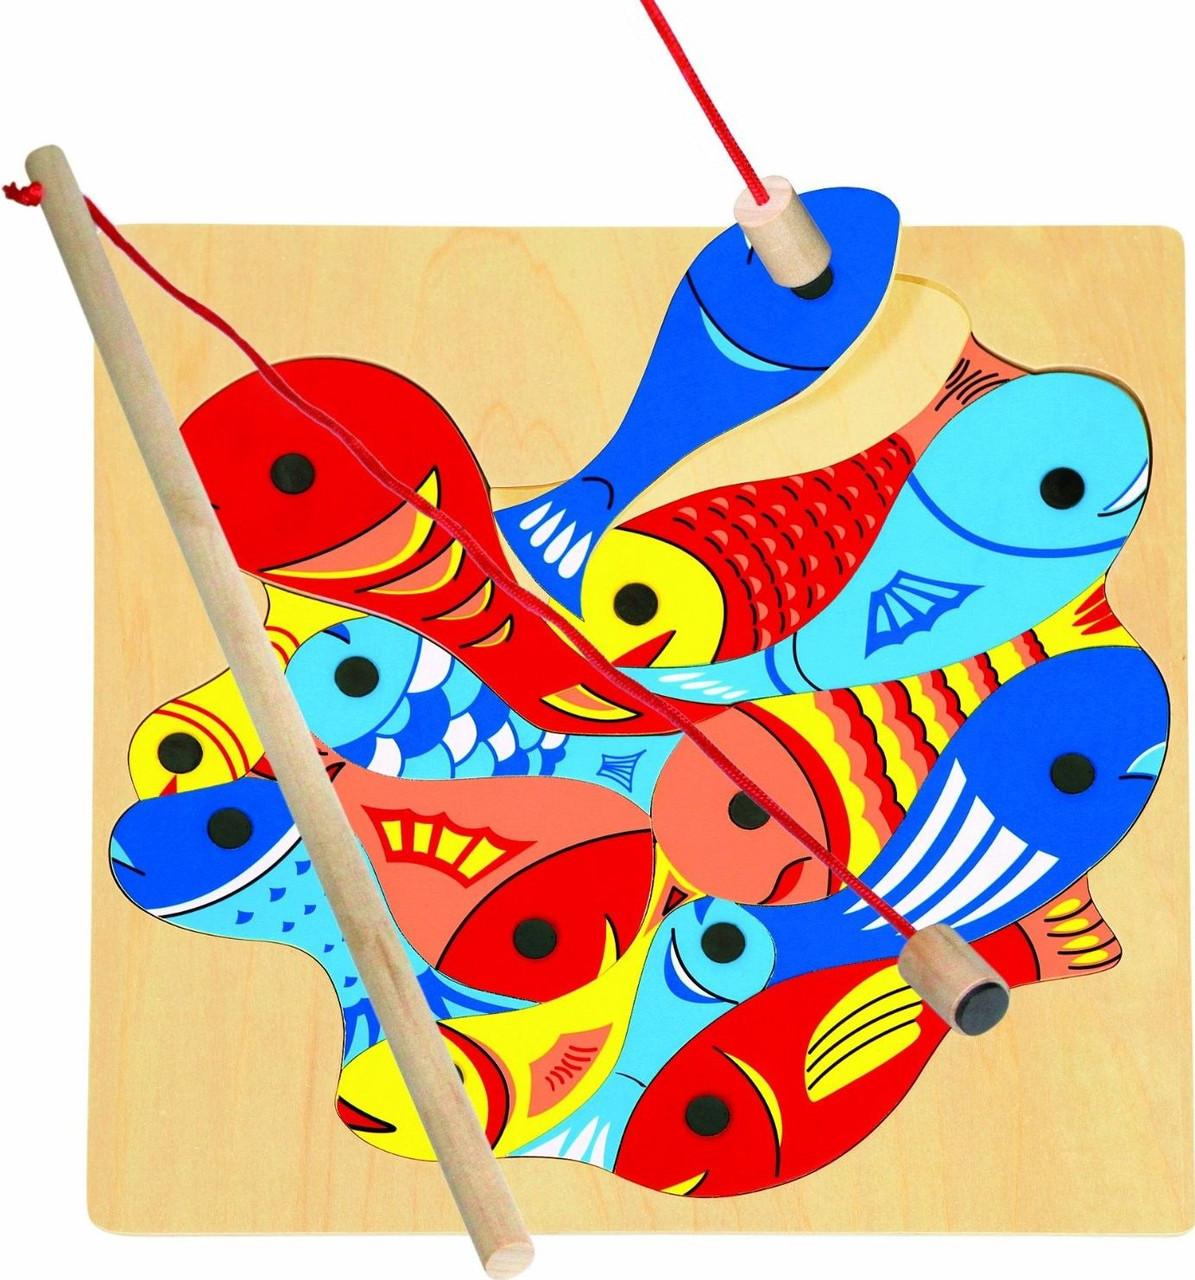 Магнитная игра - Рыбалка (2 удочки) TM Bino (82737)